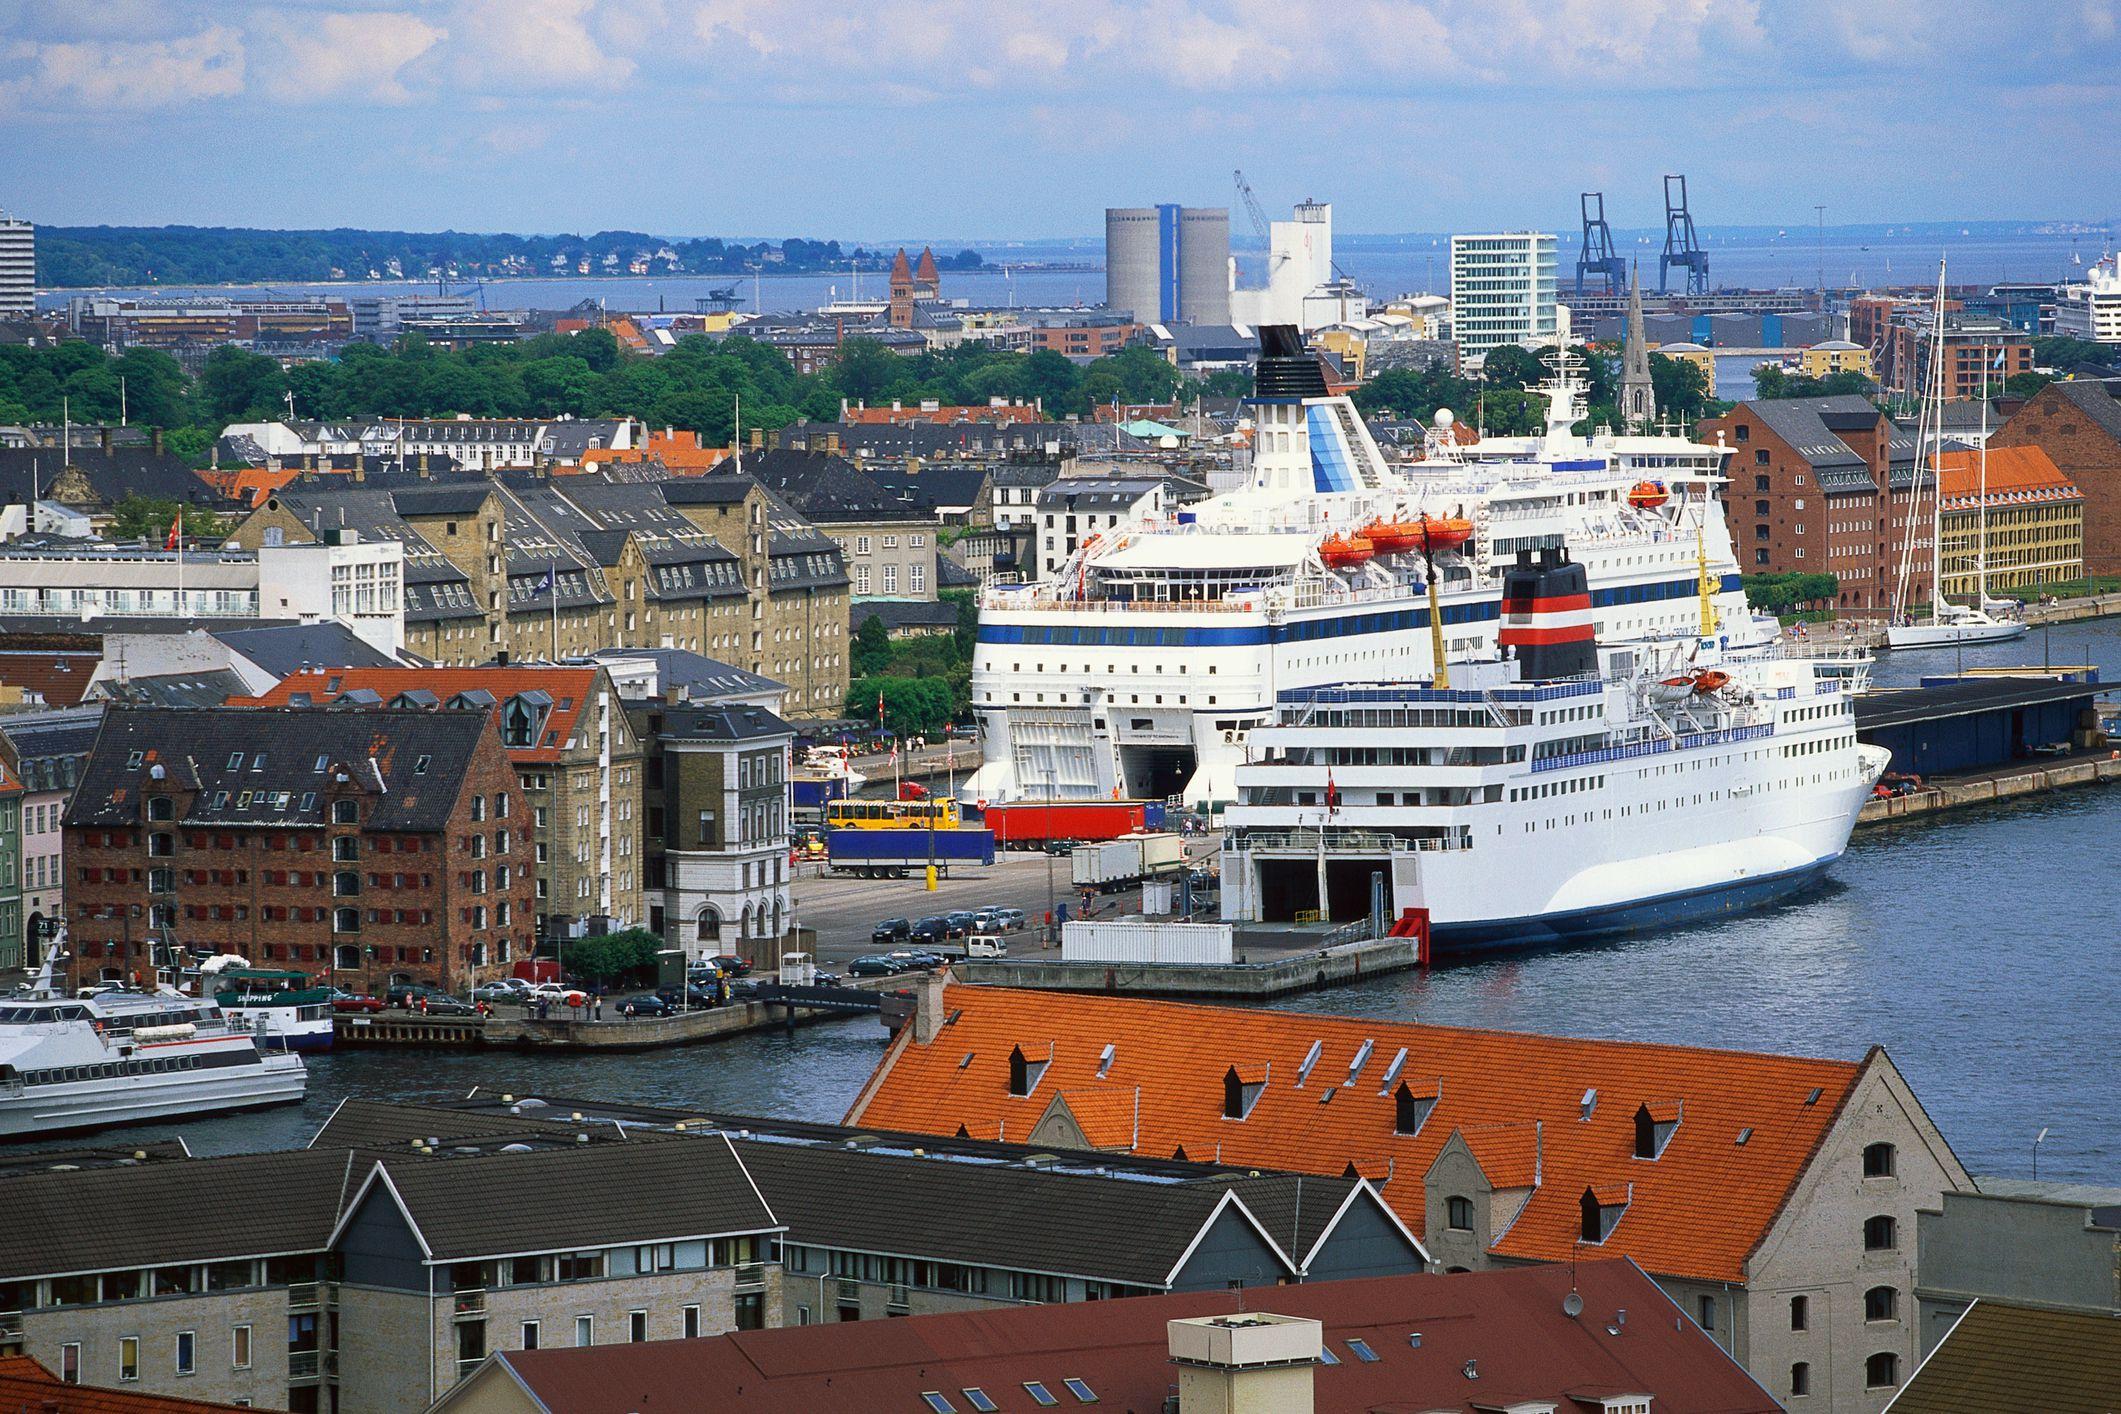 Cruise Ship Moored in Copenhagen Harbor